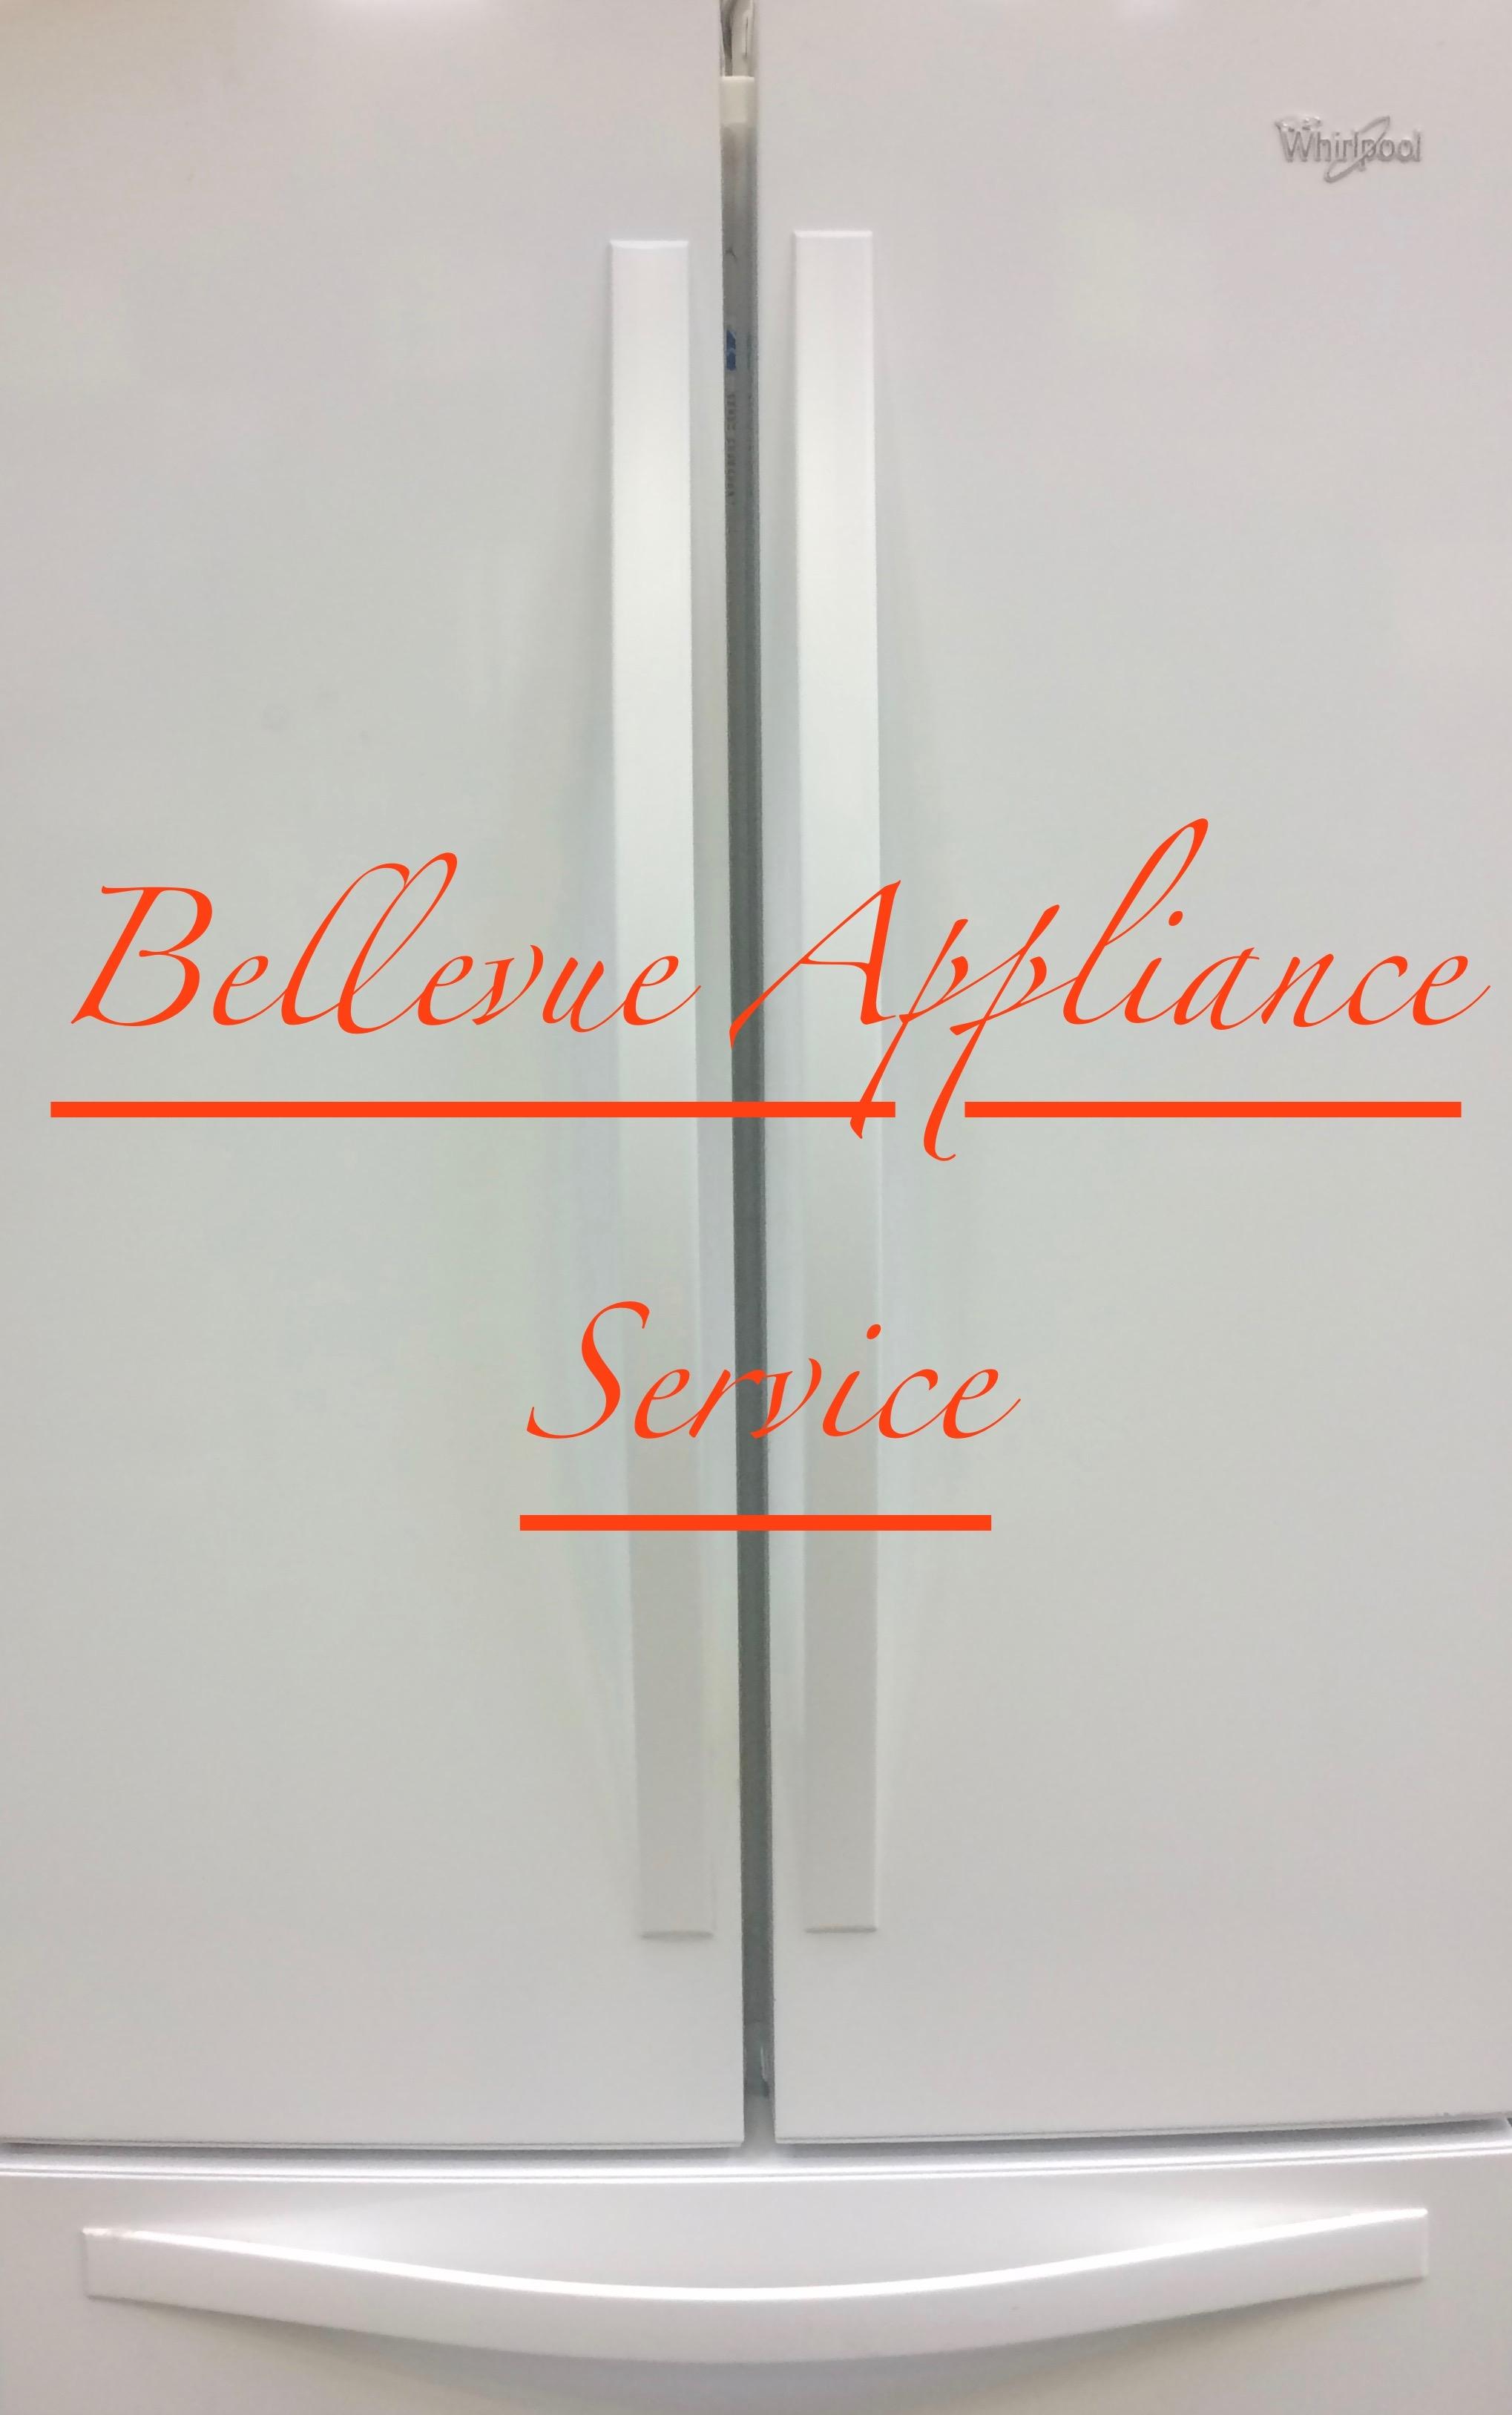 Bellevue Appliance Service image 5